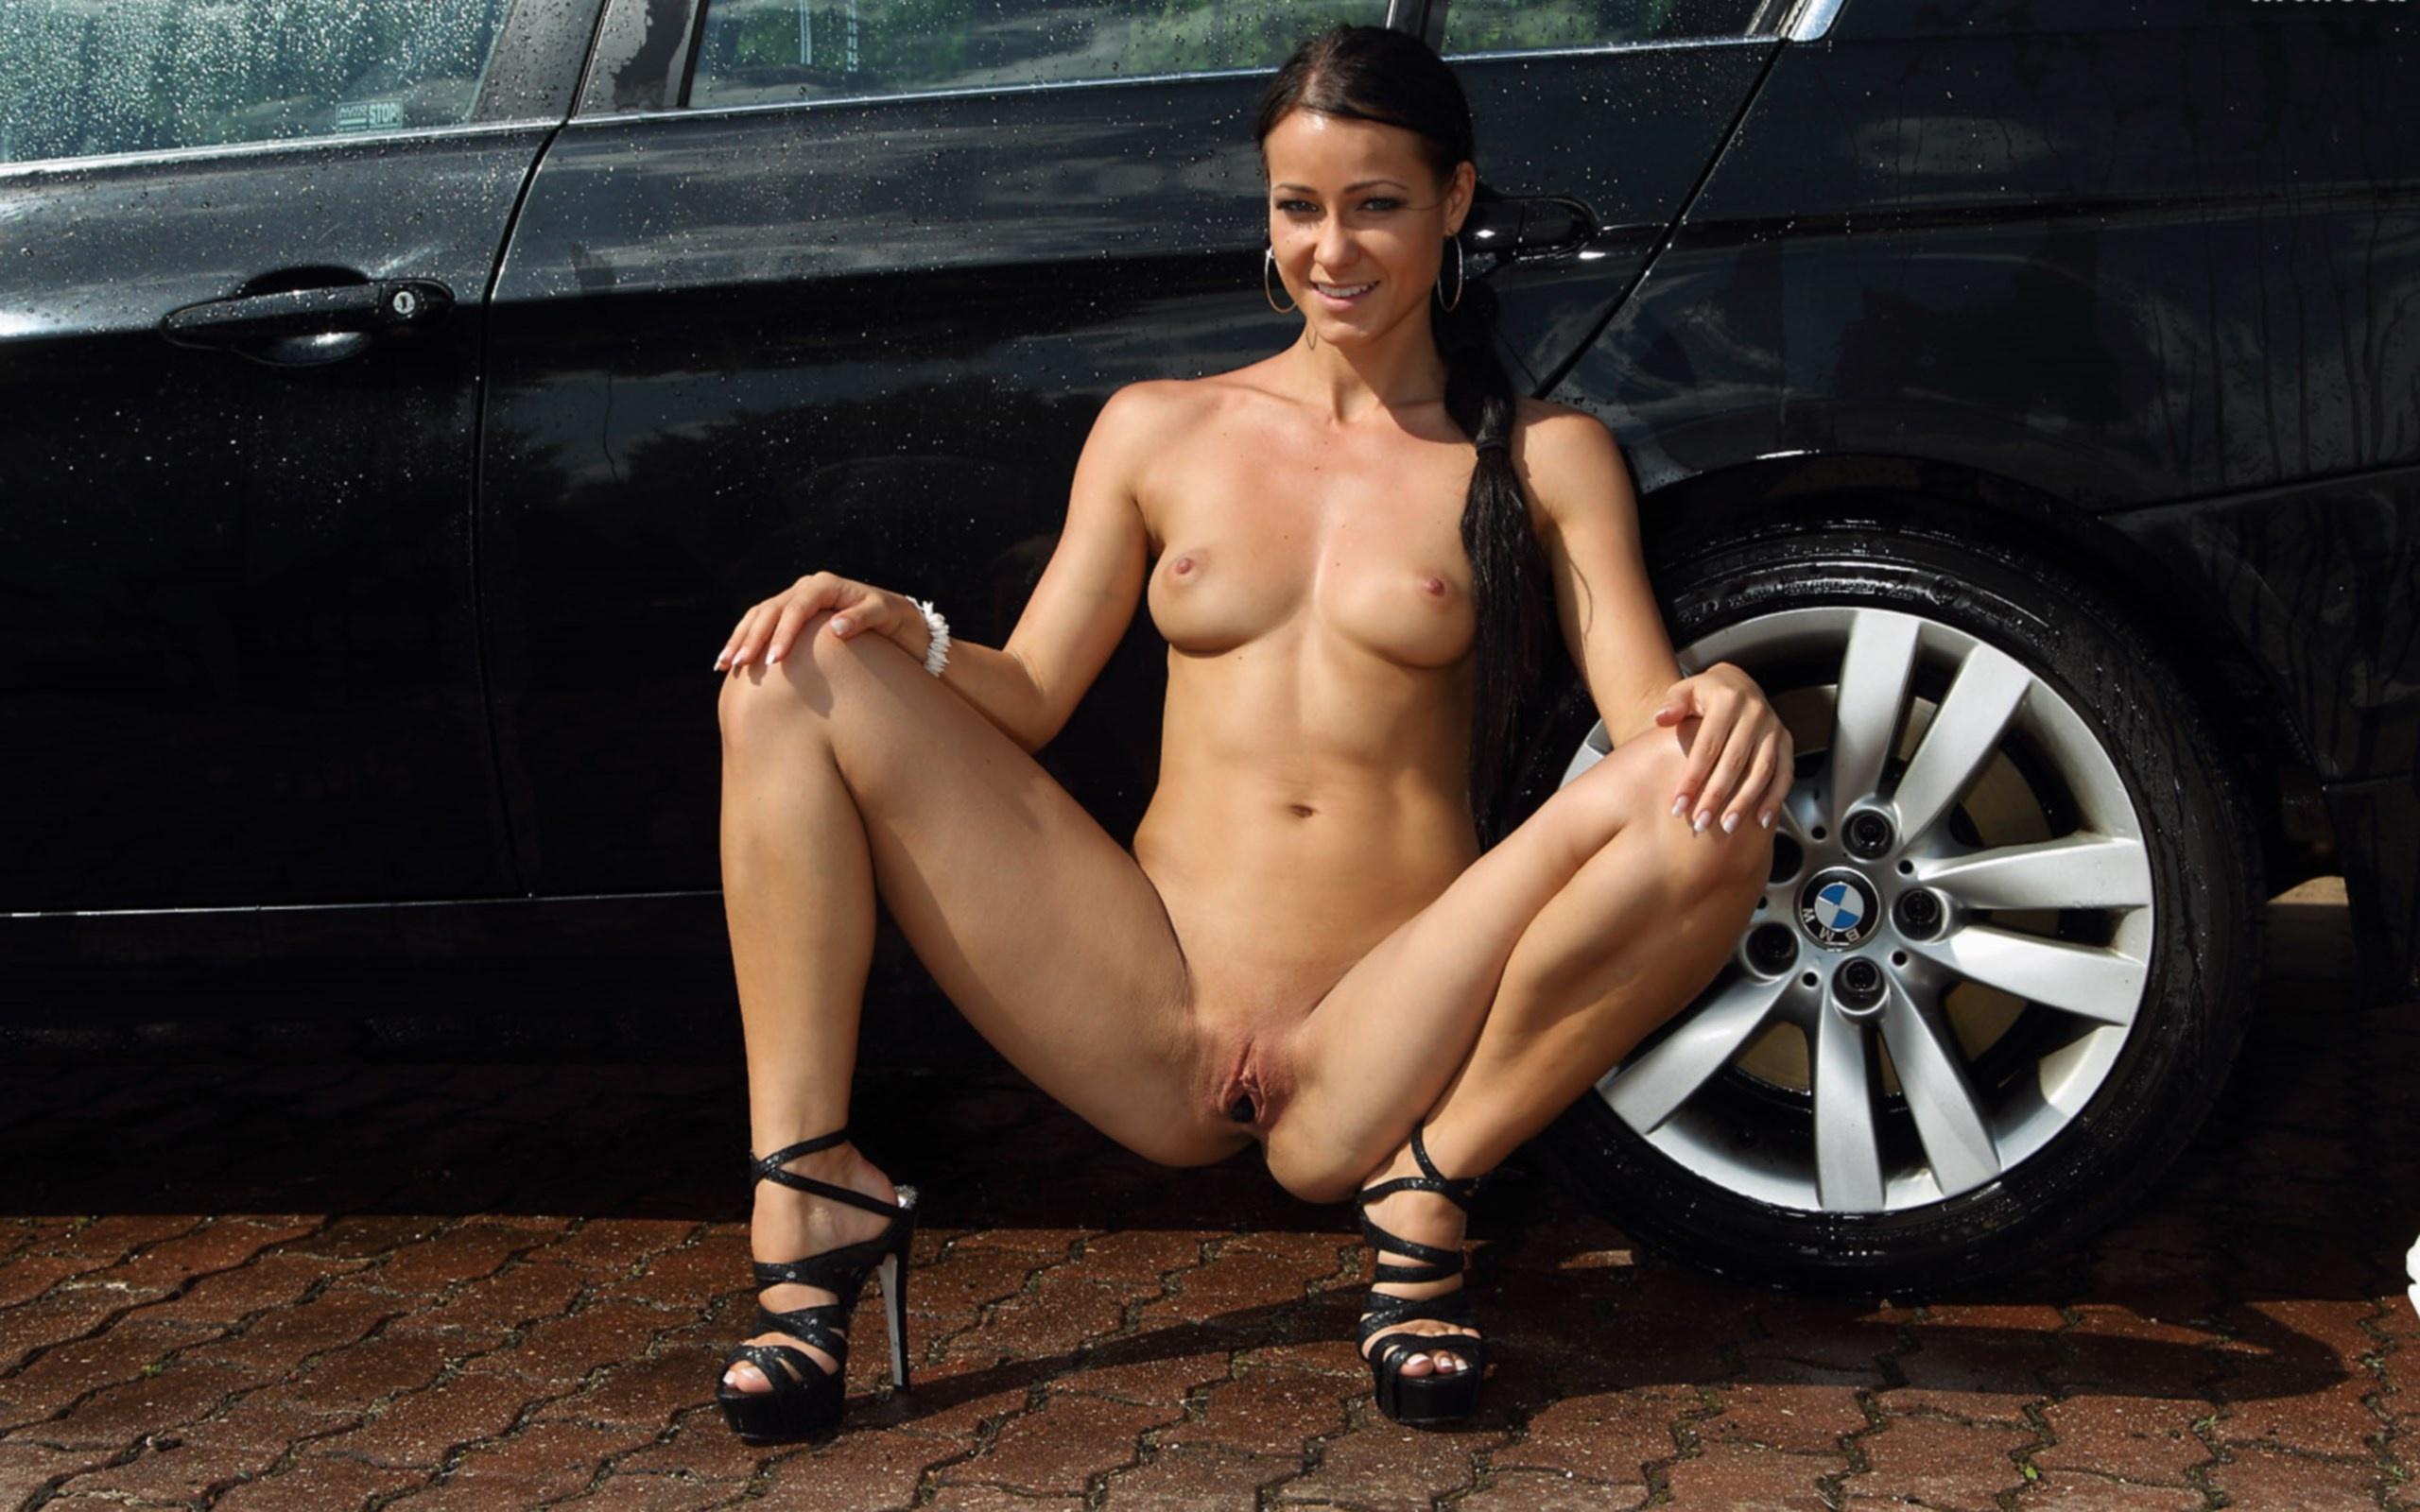 ashley-black-girl-melissa-pussy-stripped